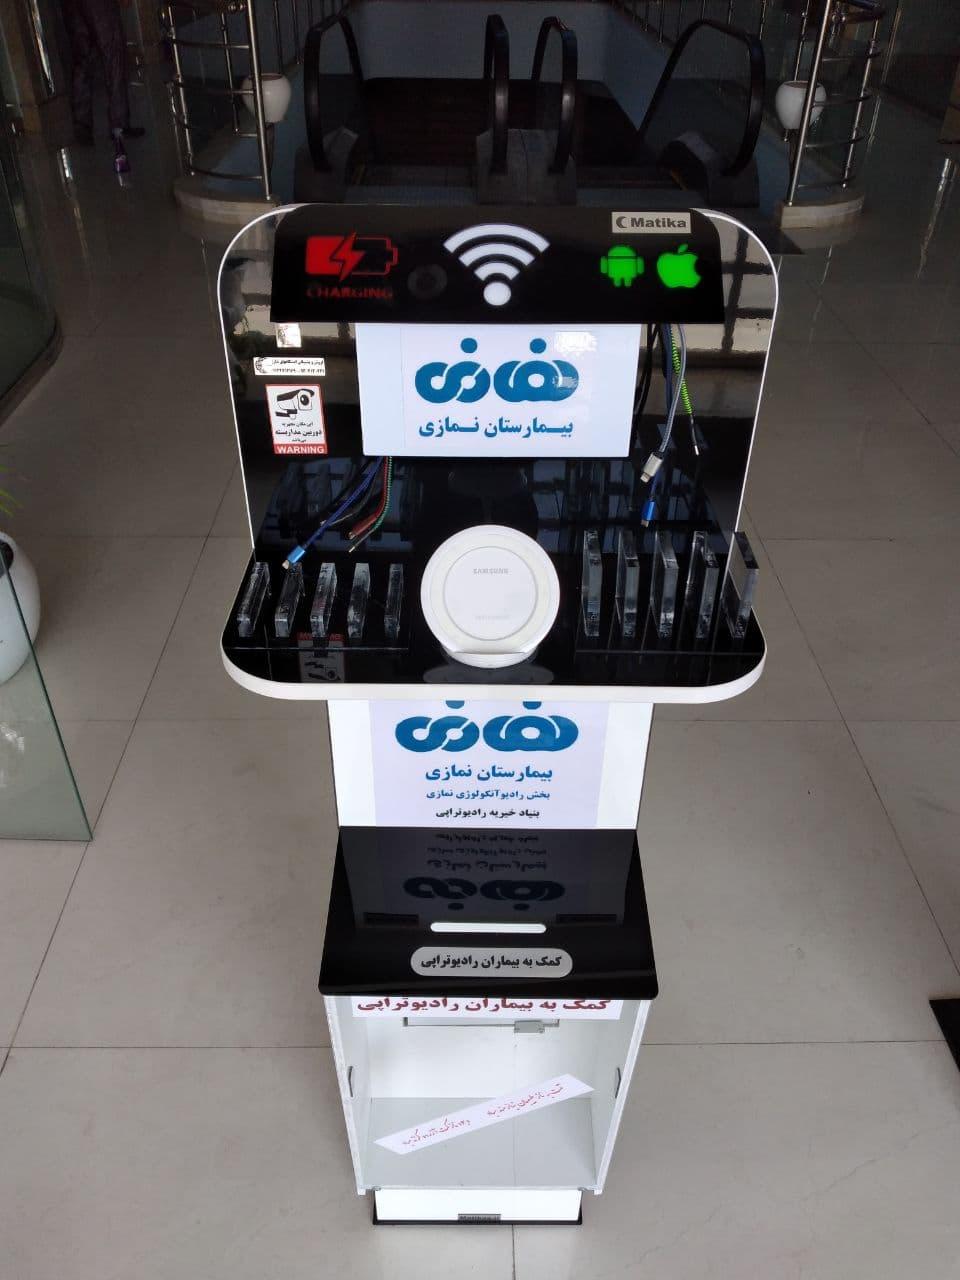 شارژر عمومی – تابلو اعلانات – تابلو اطلاعات هوشمند – شارژر چندتایی – تابلو اطلاع رسانی – شارژرها - شارژر فرودگاهی – شارژر ترمینال – شارژر بیمارستانی – باکس شارژ موبایل – شارژر باکسی – کیوسک شارژ موبایل – استند شارژ ترمینالی – استند شارژ بیمارستانی- استند شارژ هتلی – استند شارژ رستوران – ایستگاه شارژ هتل – ایستگاه شارژ بیمارستان – ایستگاه شارژ ترمینال –  کیوسک شارژ هتل – کیوسک شارژ بیمارستان – کیوسک شارژ ترمینال – کیوسک شارژ رستوران